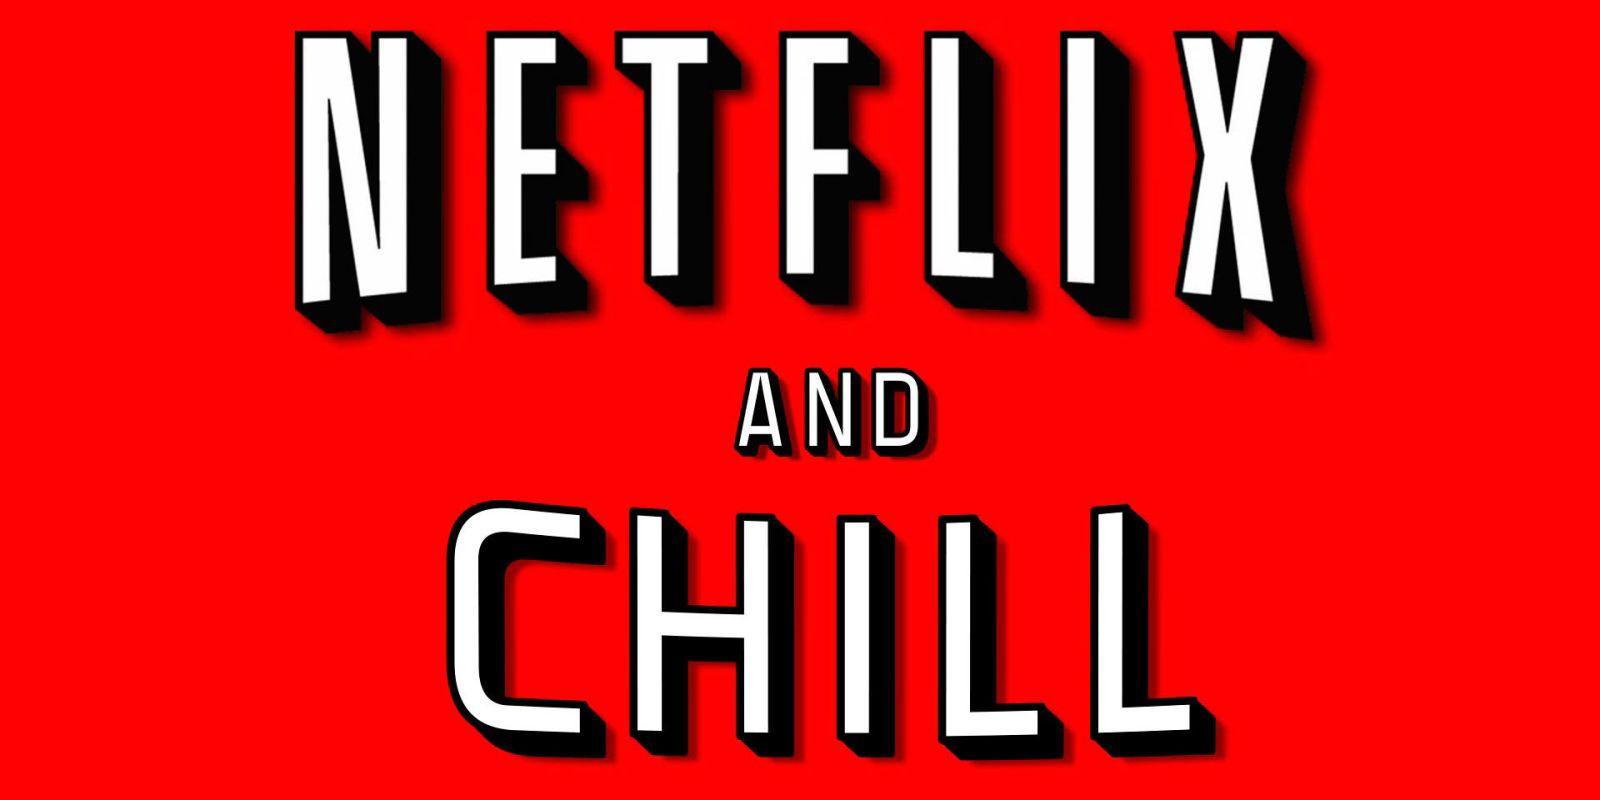 Swipe and chill